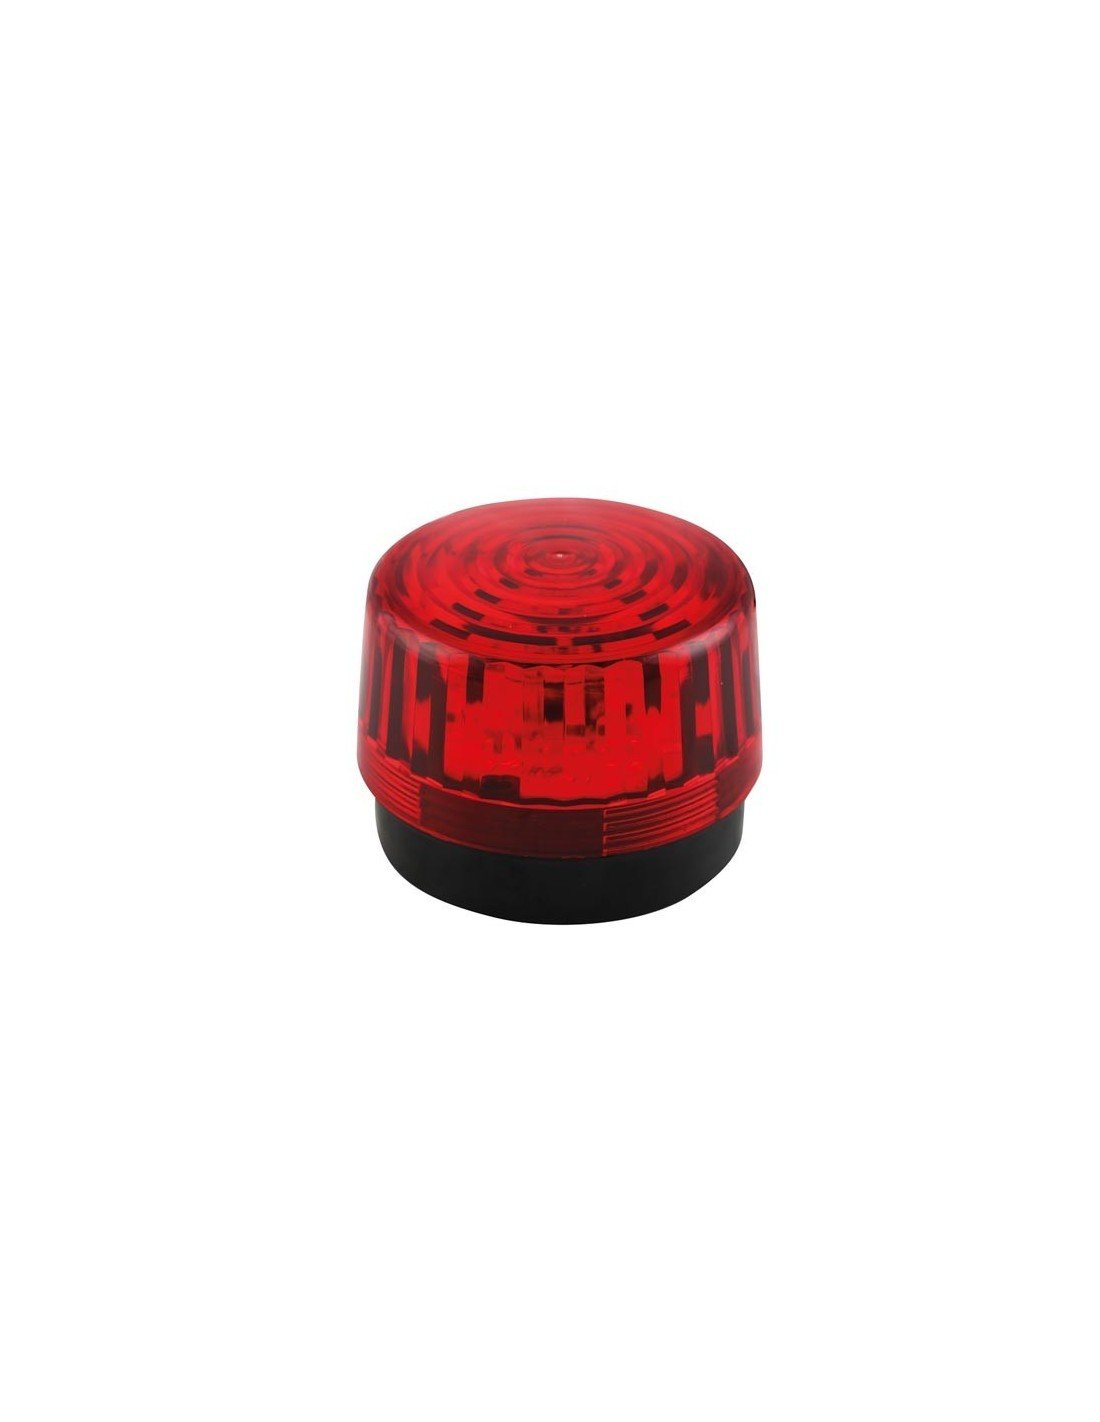 Velleman 640920 LED Blitzlicht, 12 VDC, Rot HAA100RN